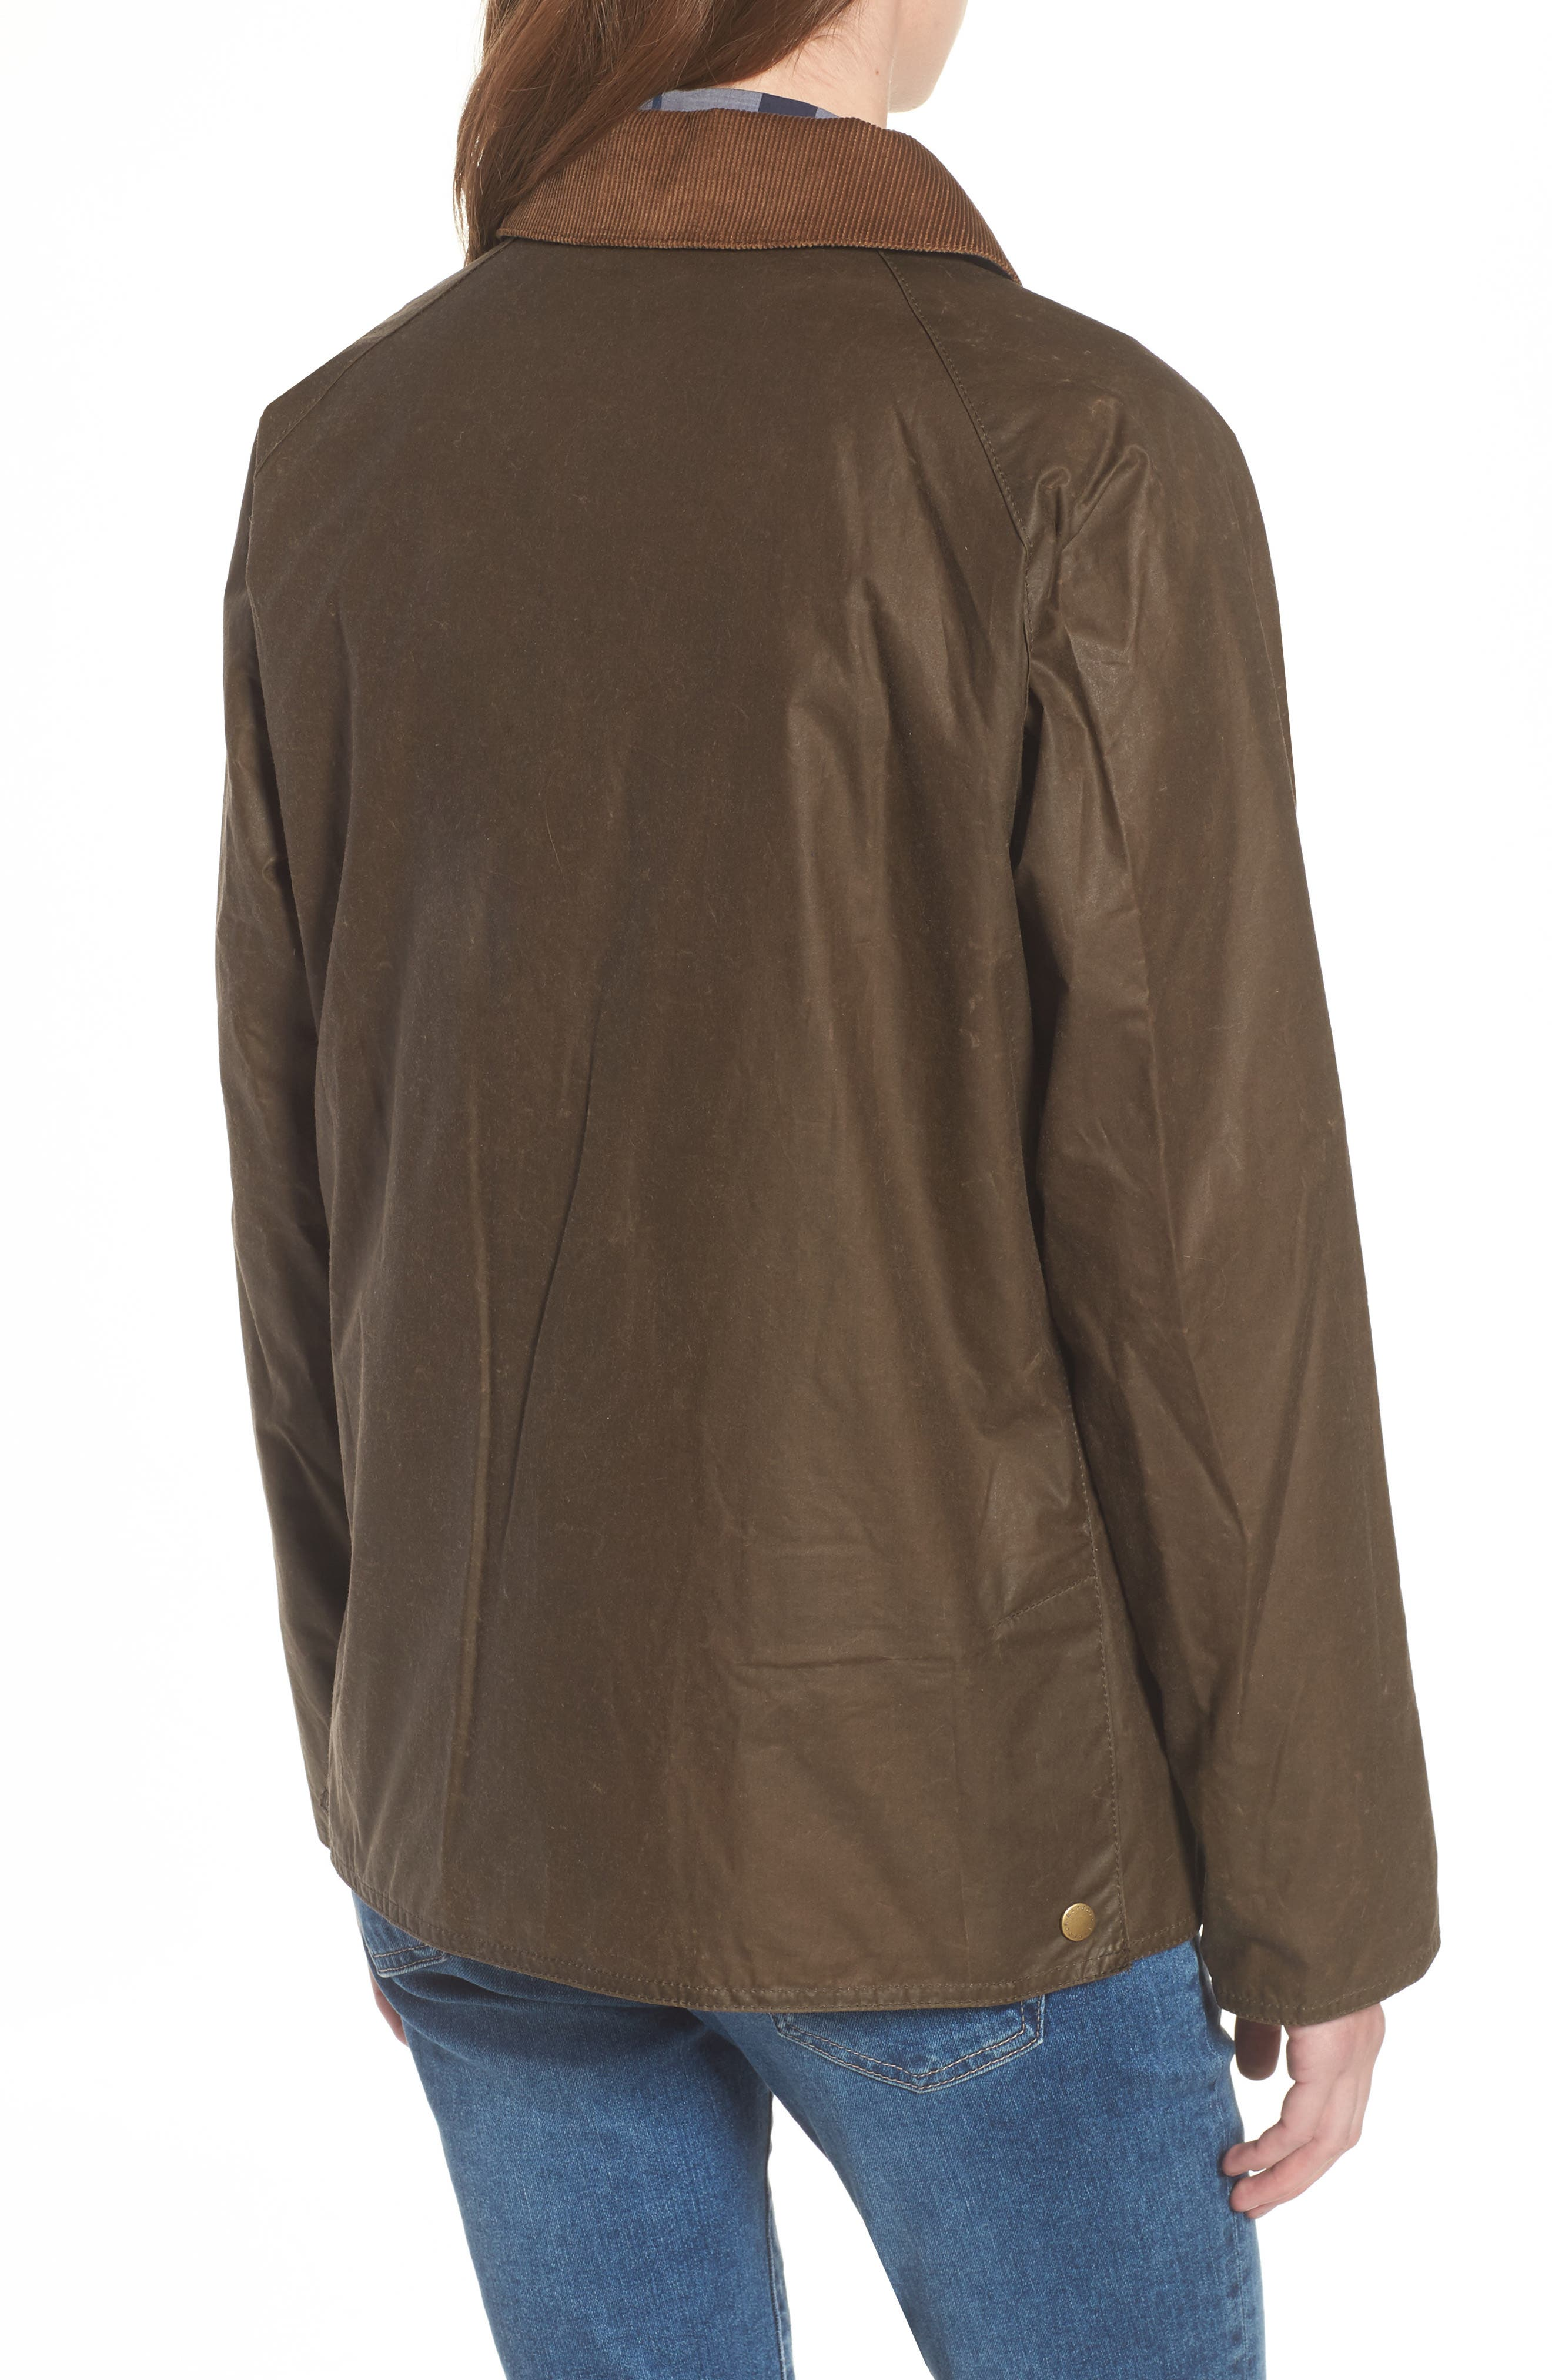 Acorn Water Resistant Waxed Cotton Jacket,                             Alternate thumbnail 2, color,                             230